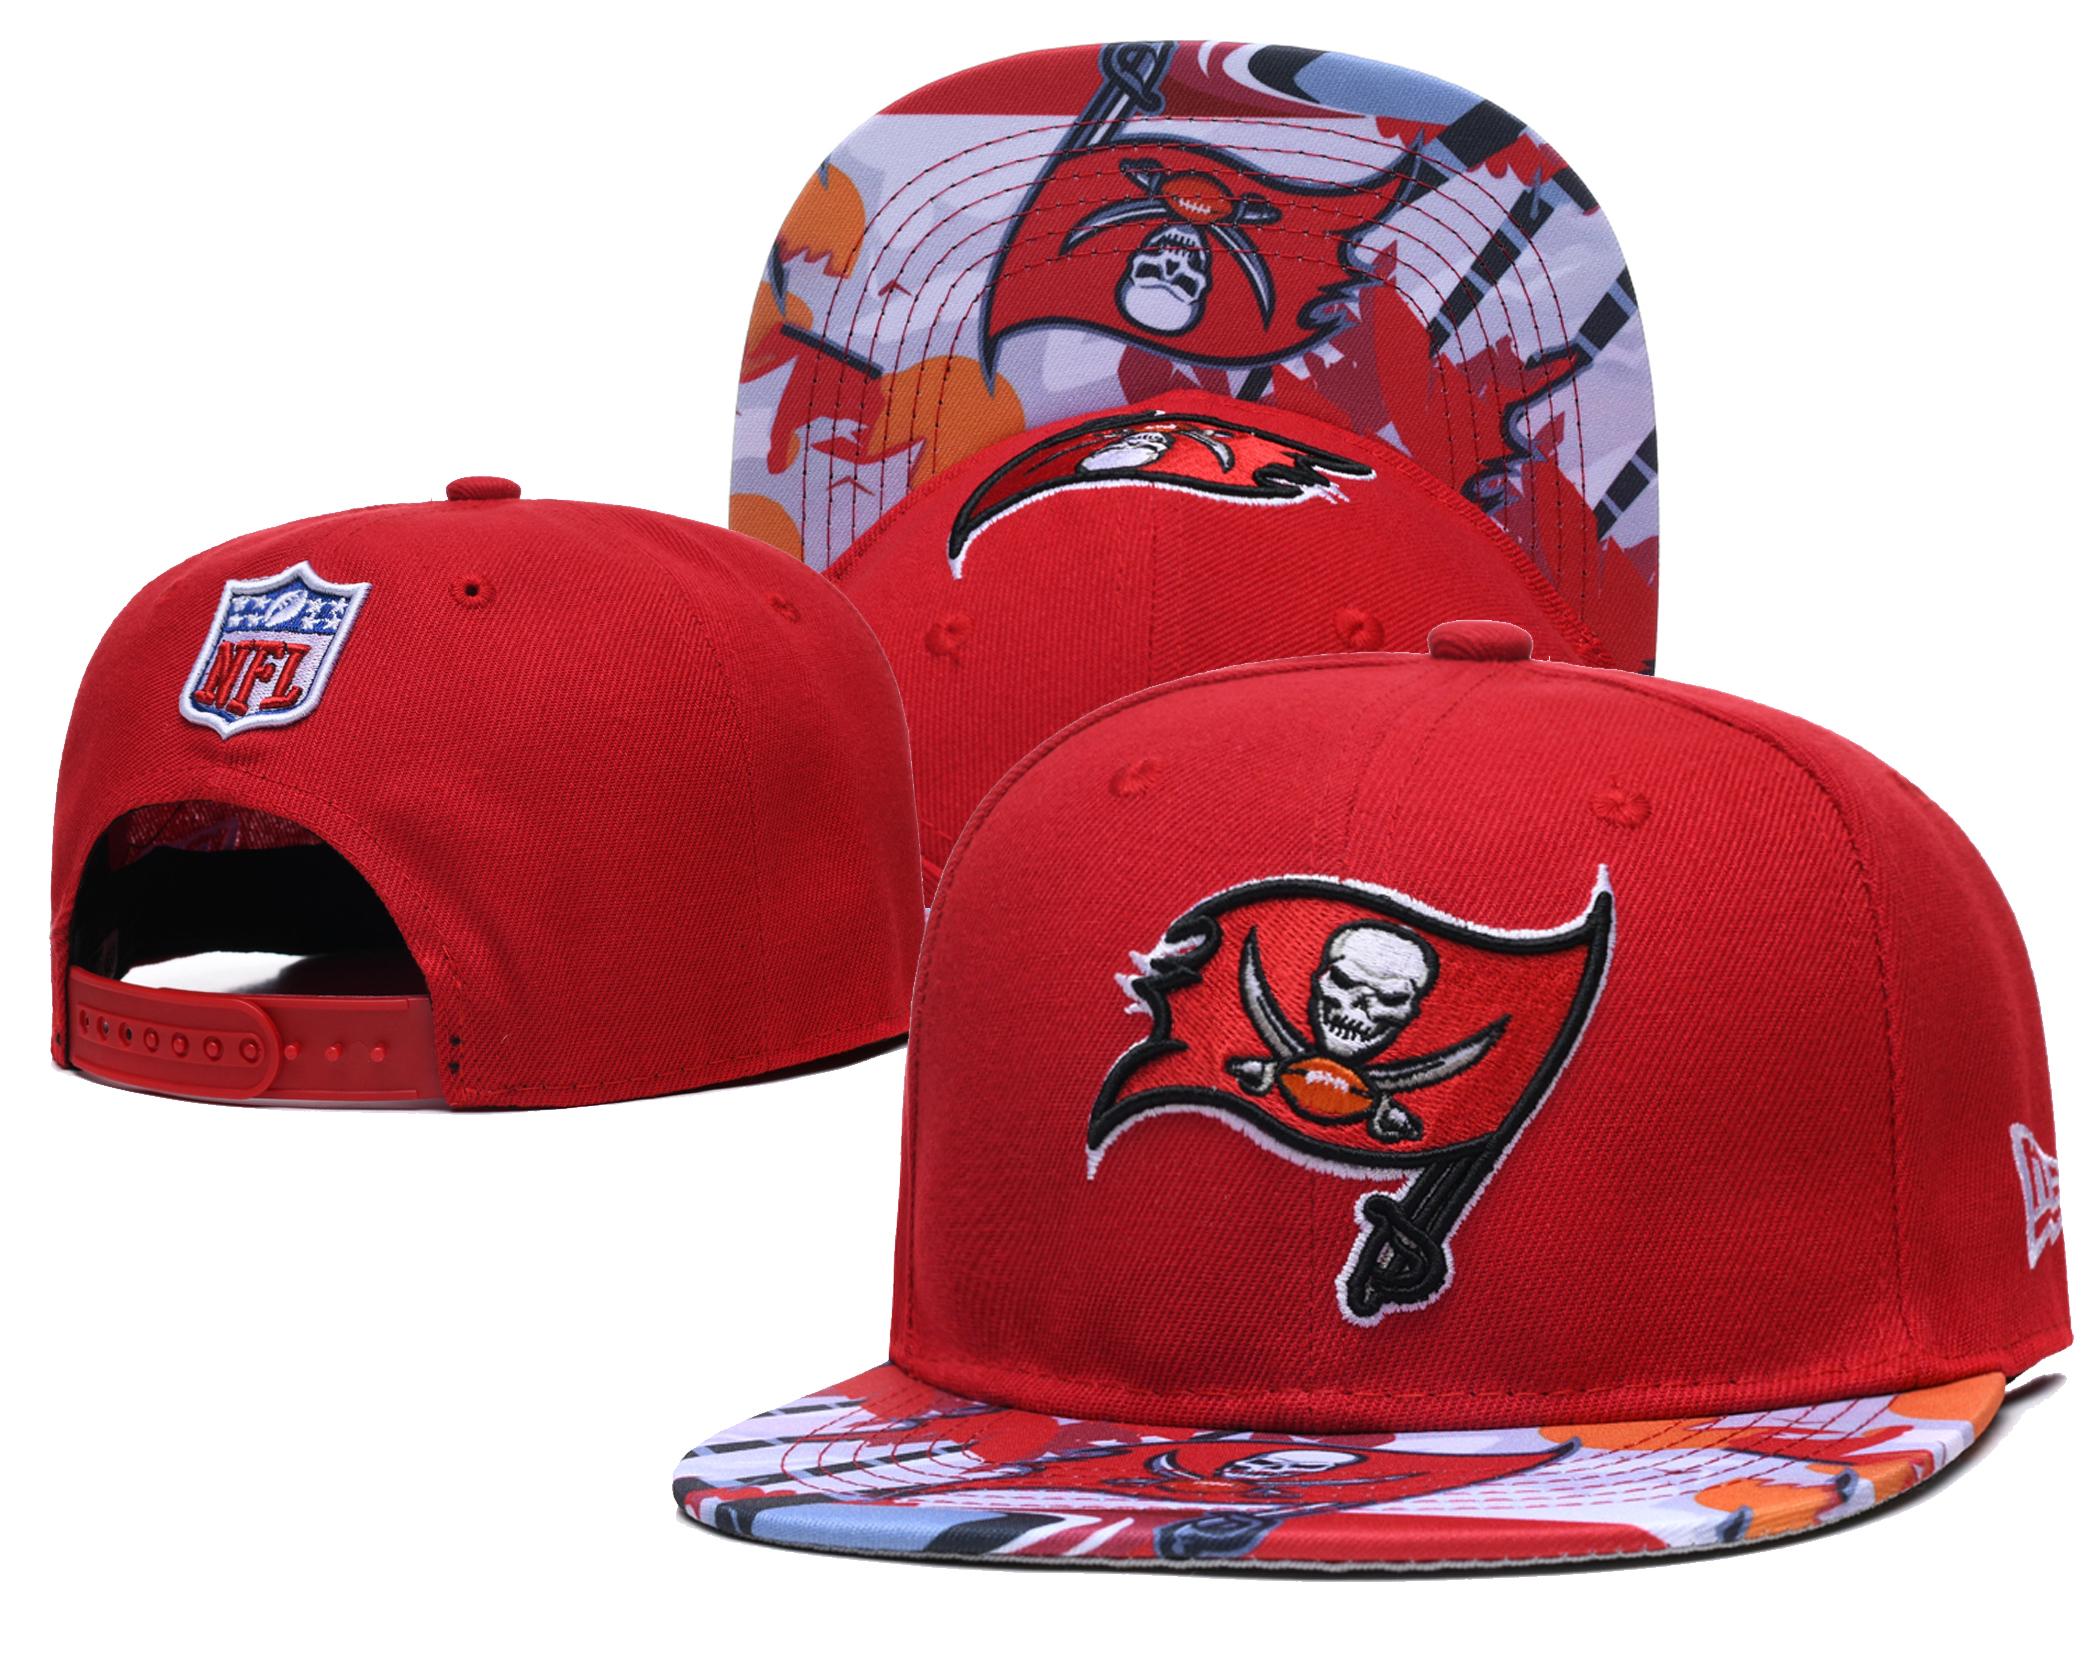 Buccaneers Team Logo Red Adjustable Hat LH